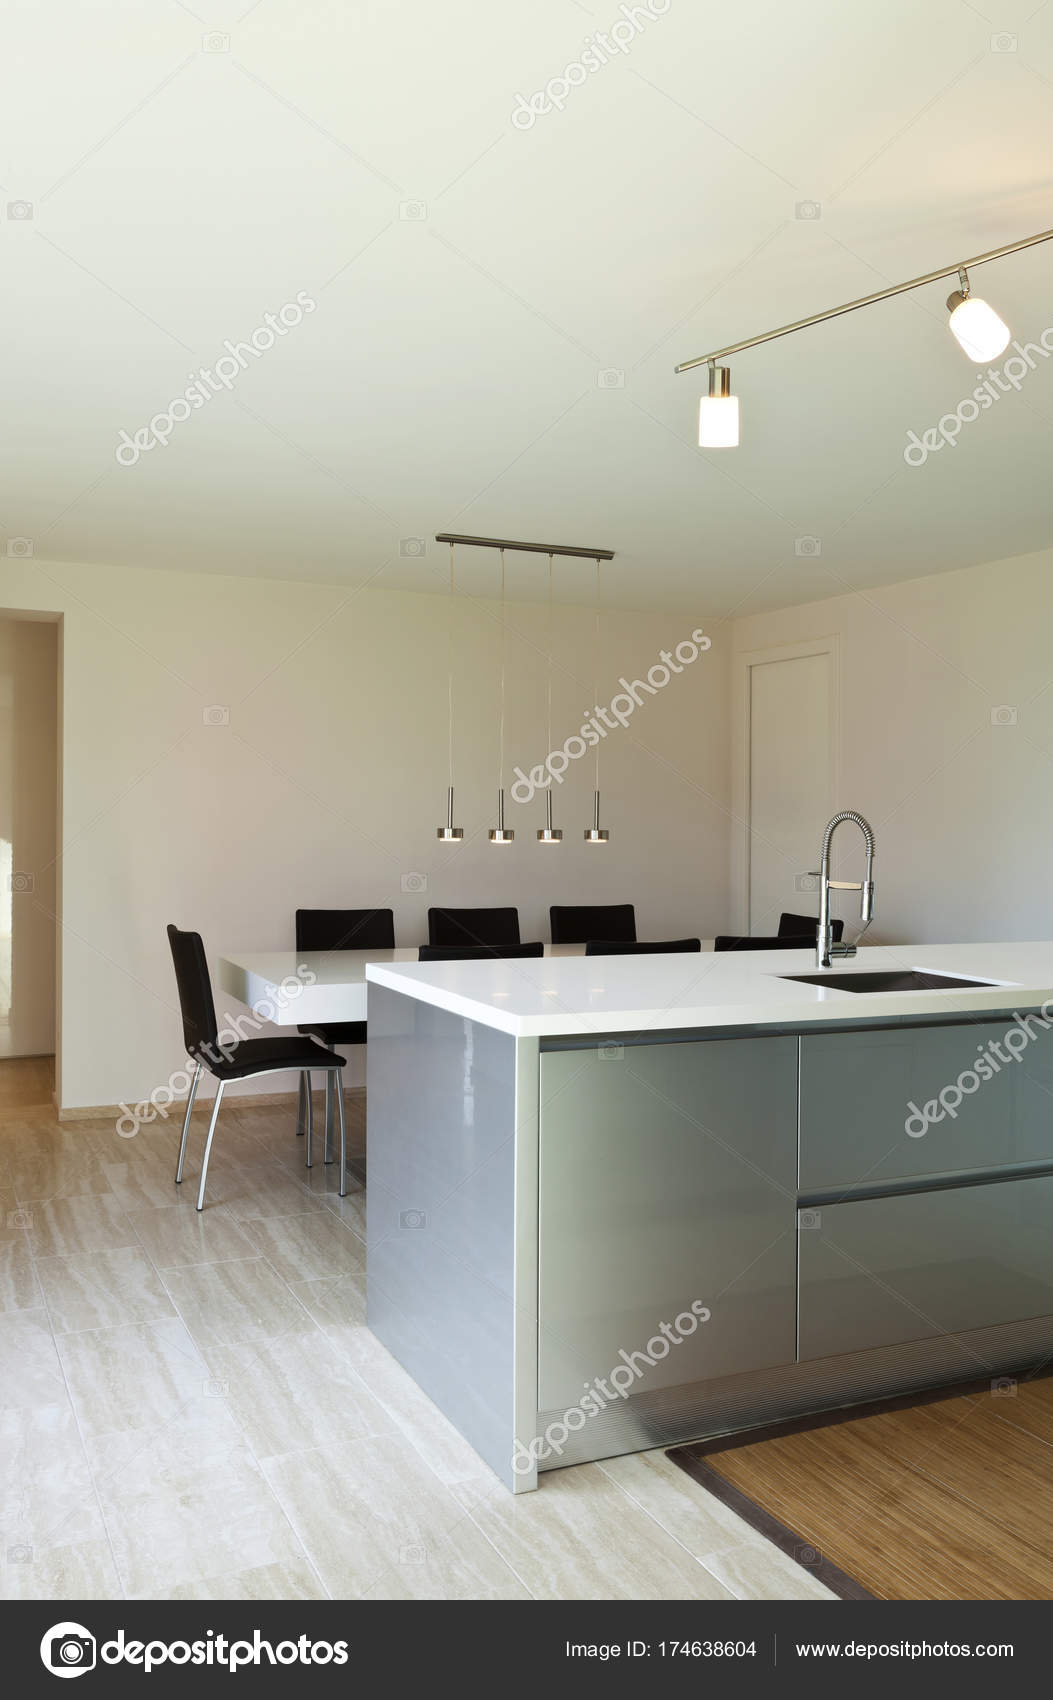 Beautiful modern house kitchen island photo by zveiger